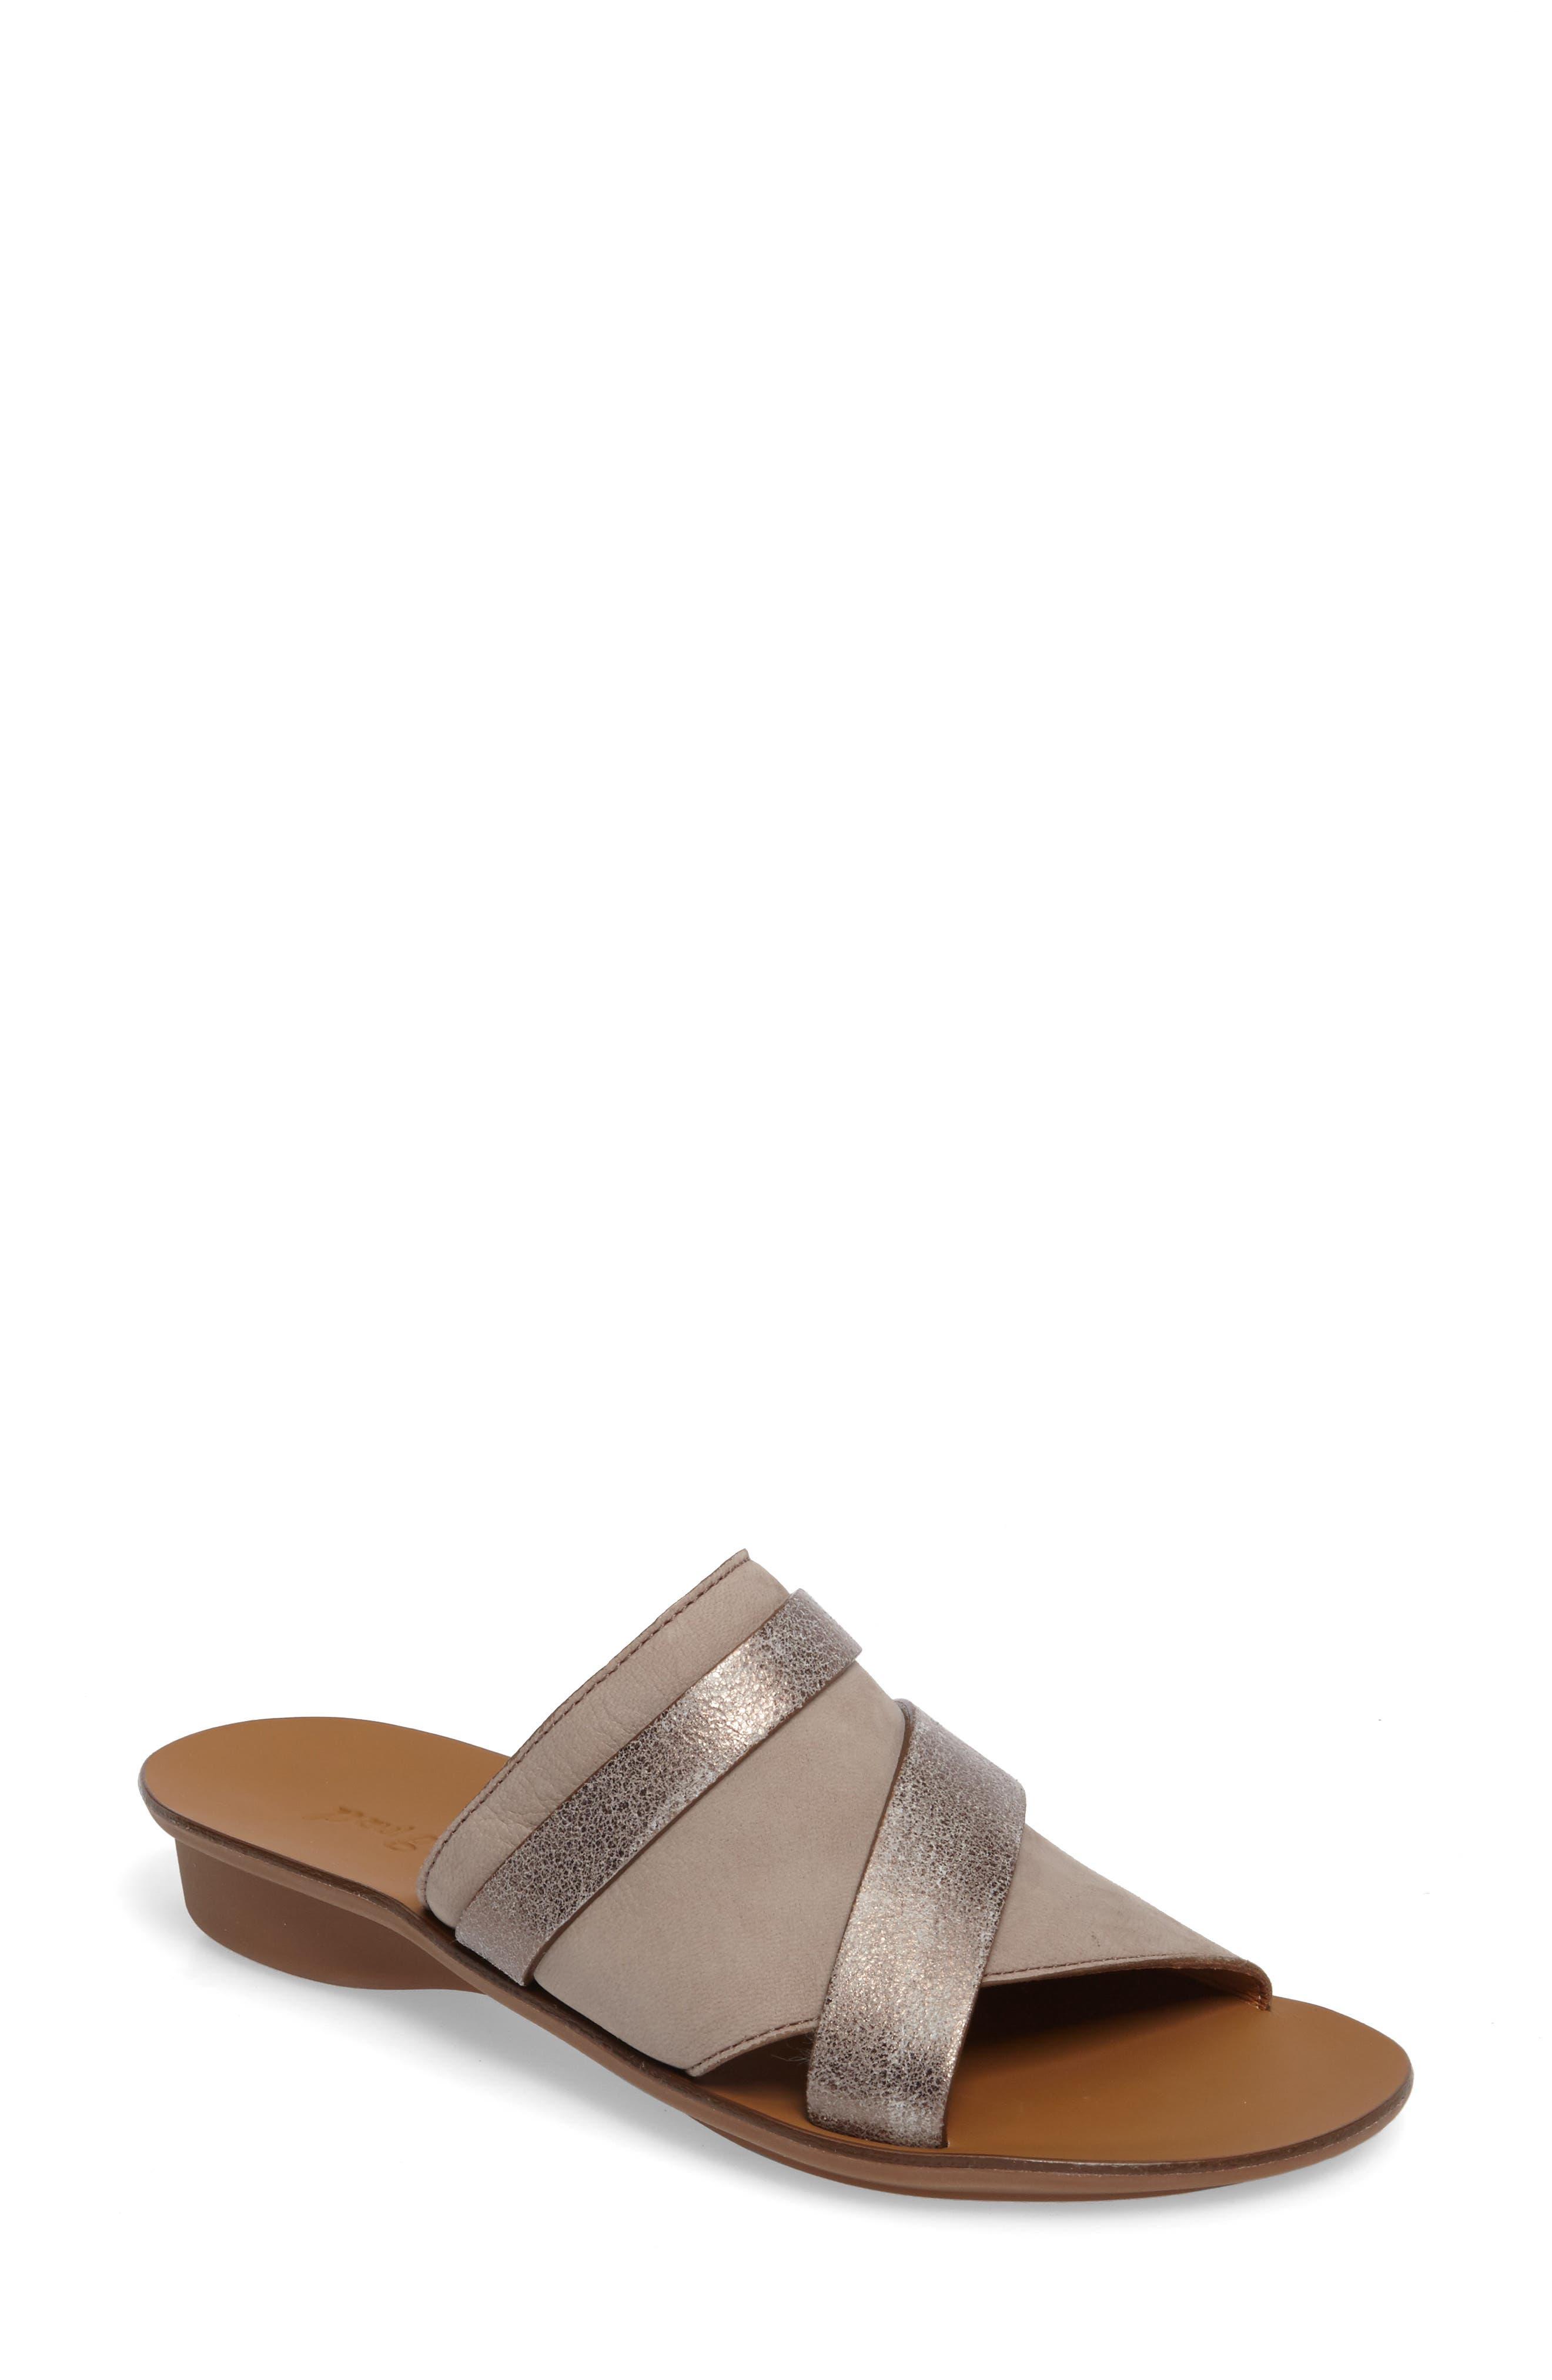 'Bayside' Leather Sandal,                         Main,                         color, GREY